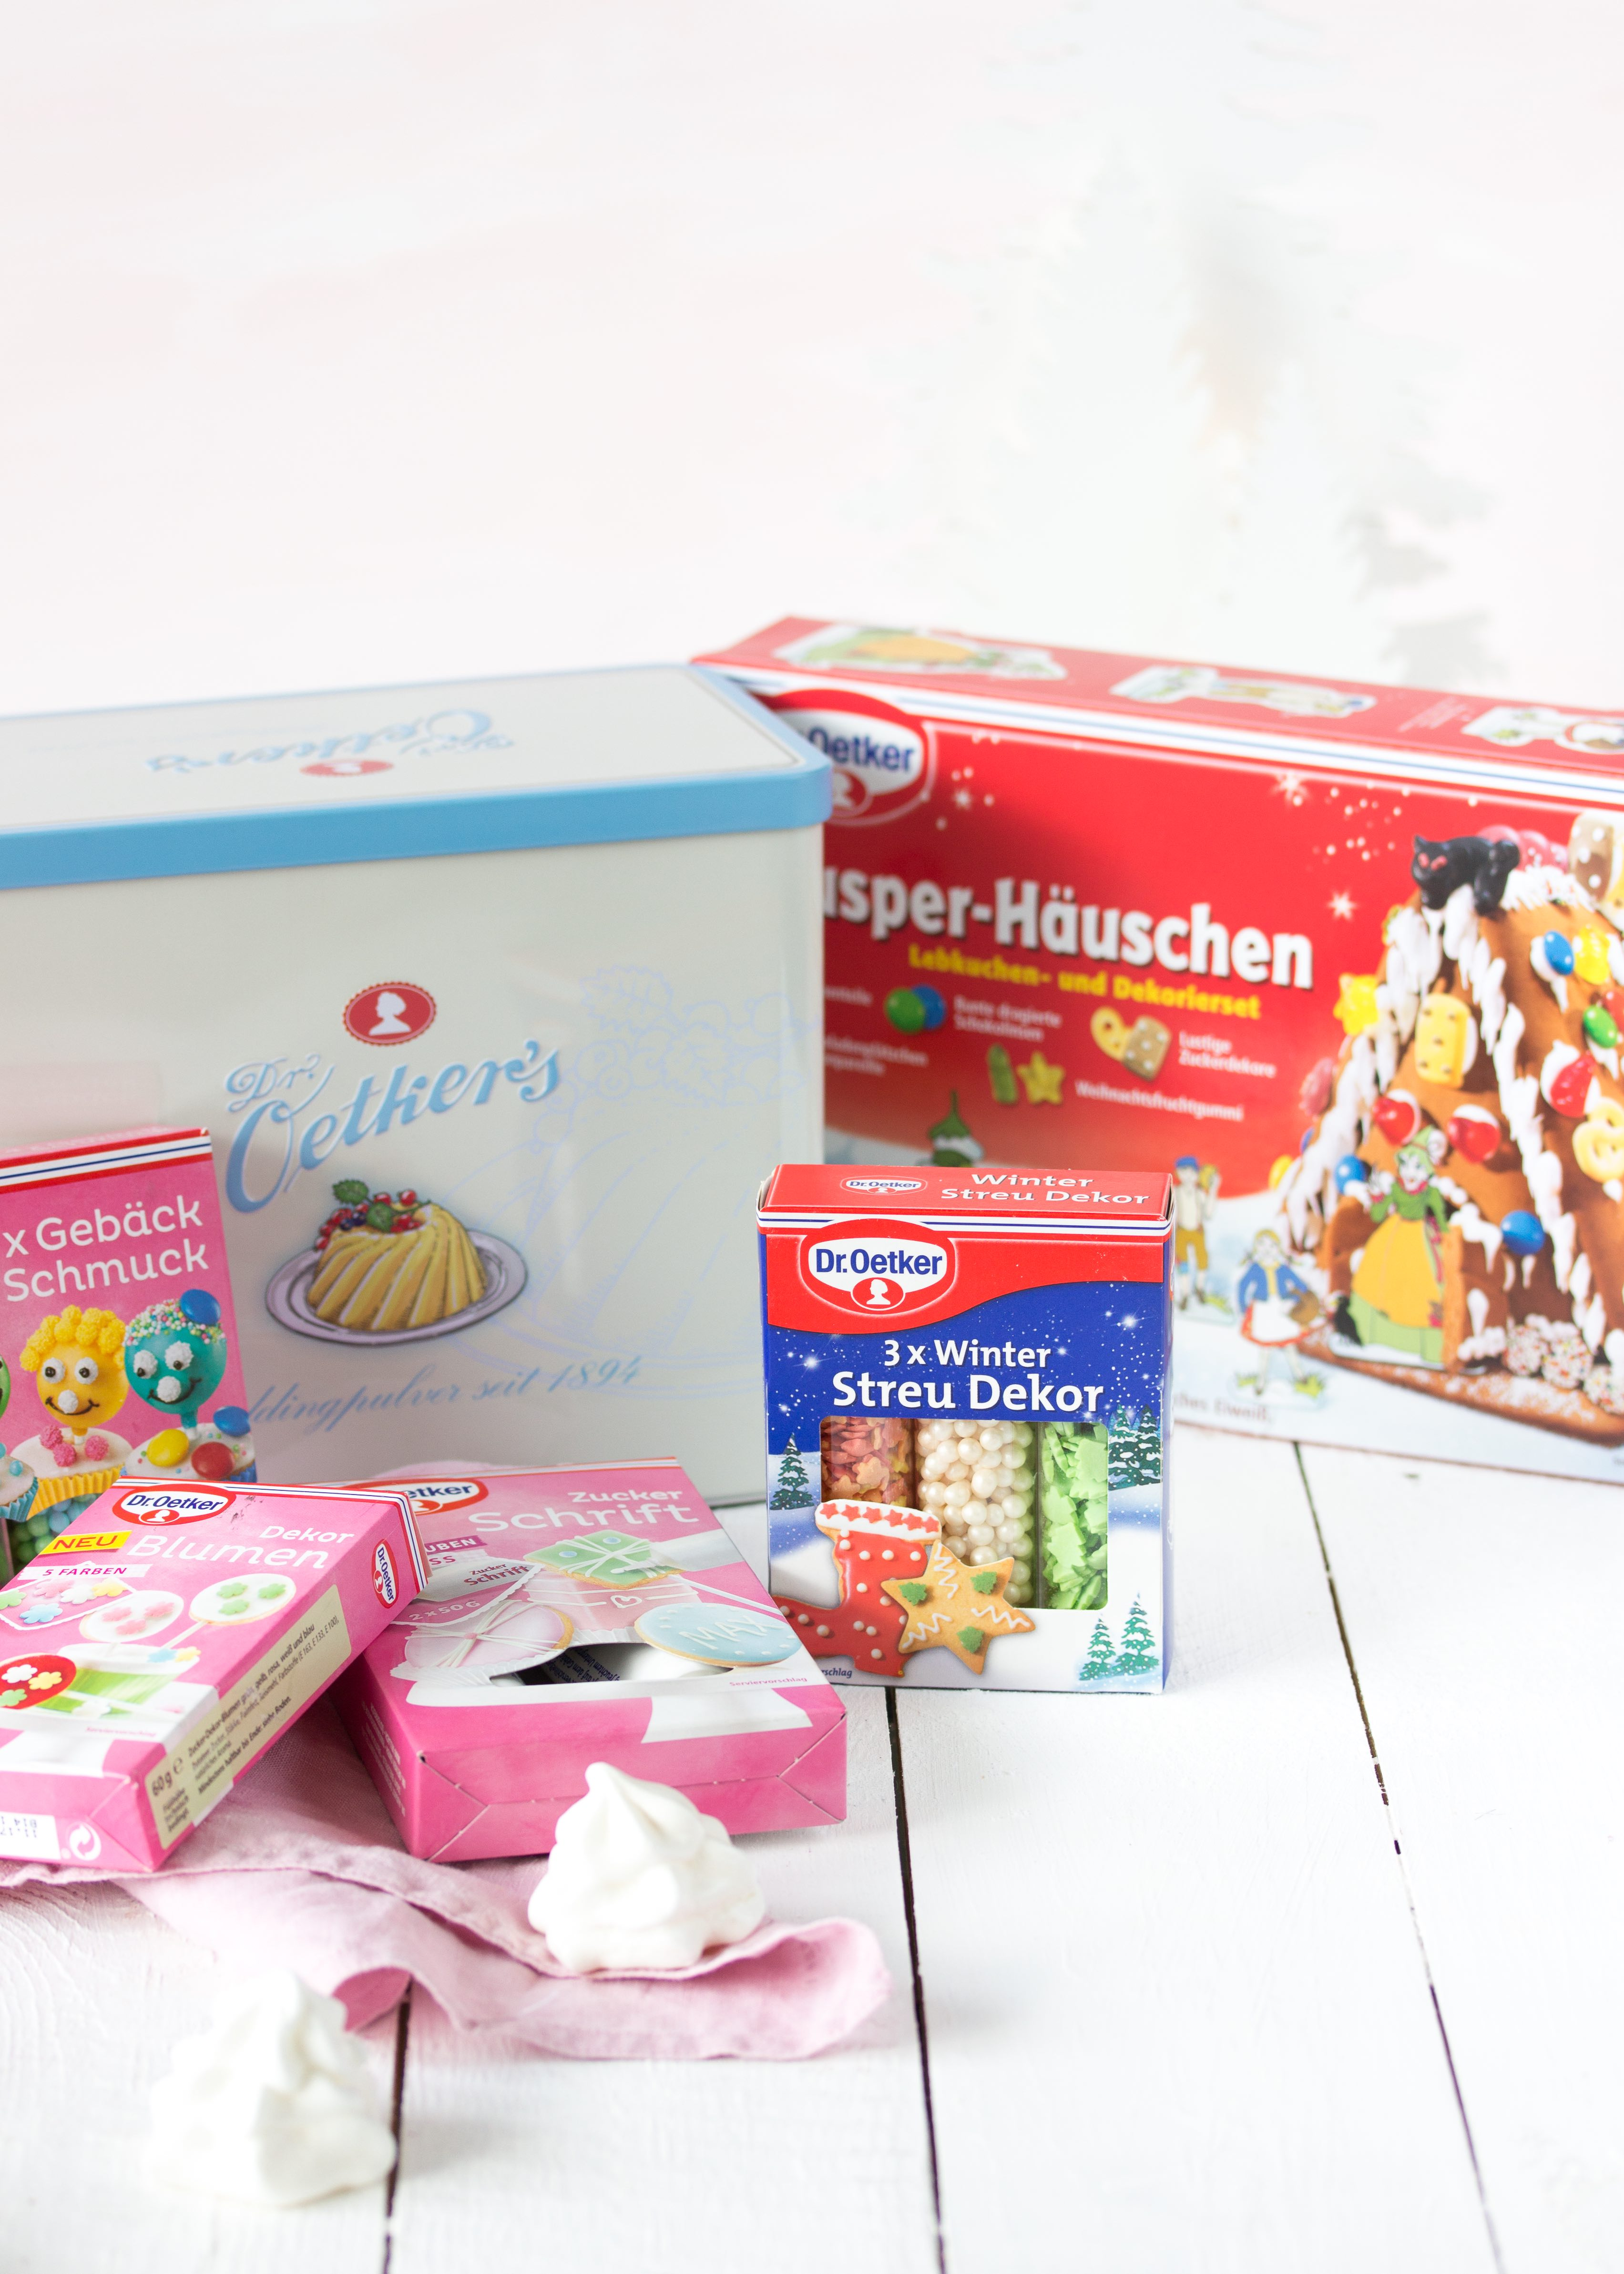 DIY Knusperhäuschen Dekorieren Lebkuchen Gingerbread Weihnachten Christmas